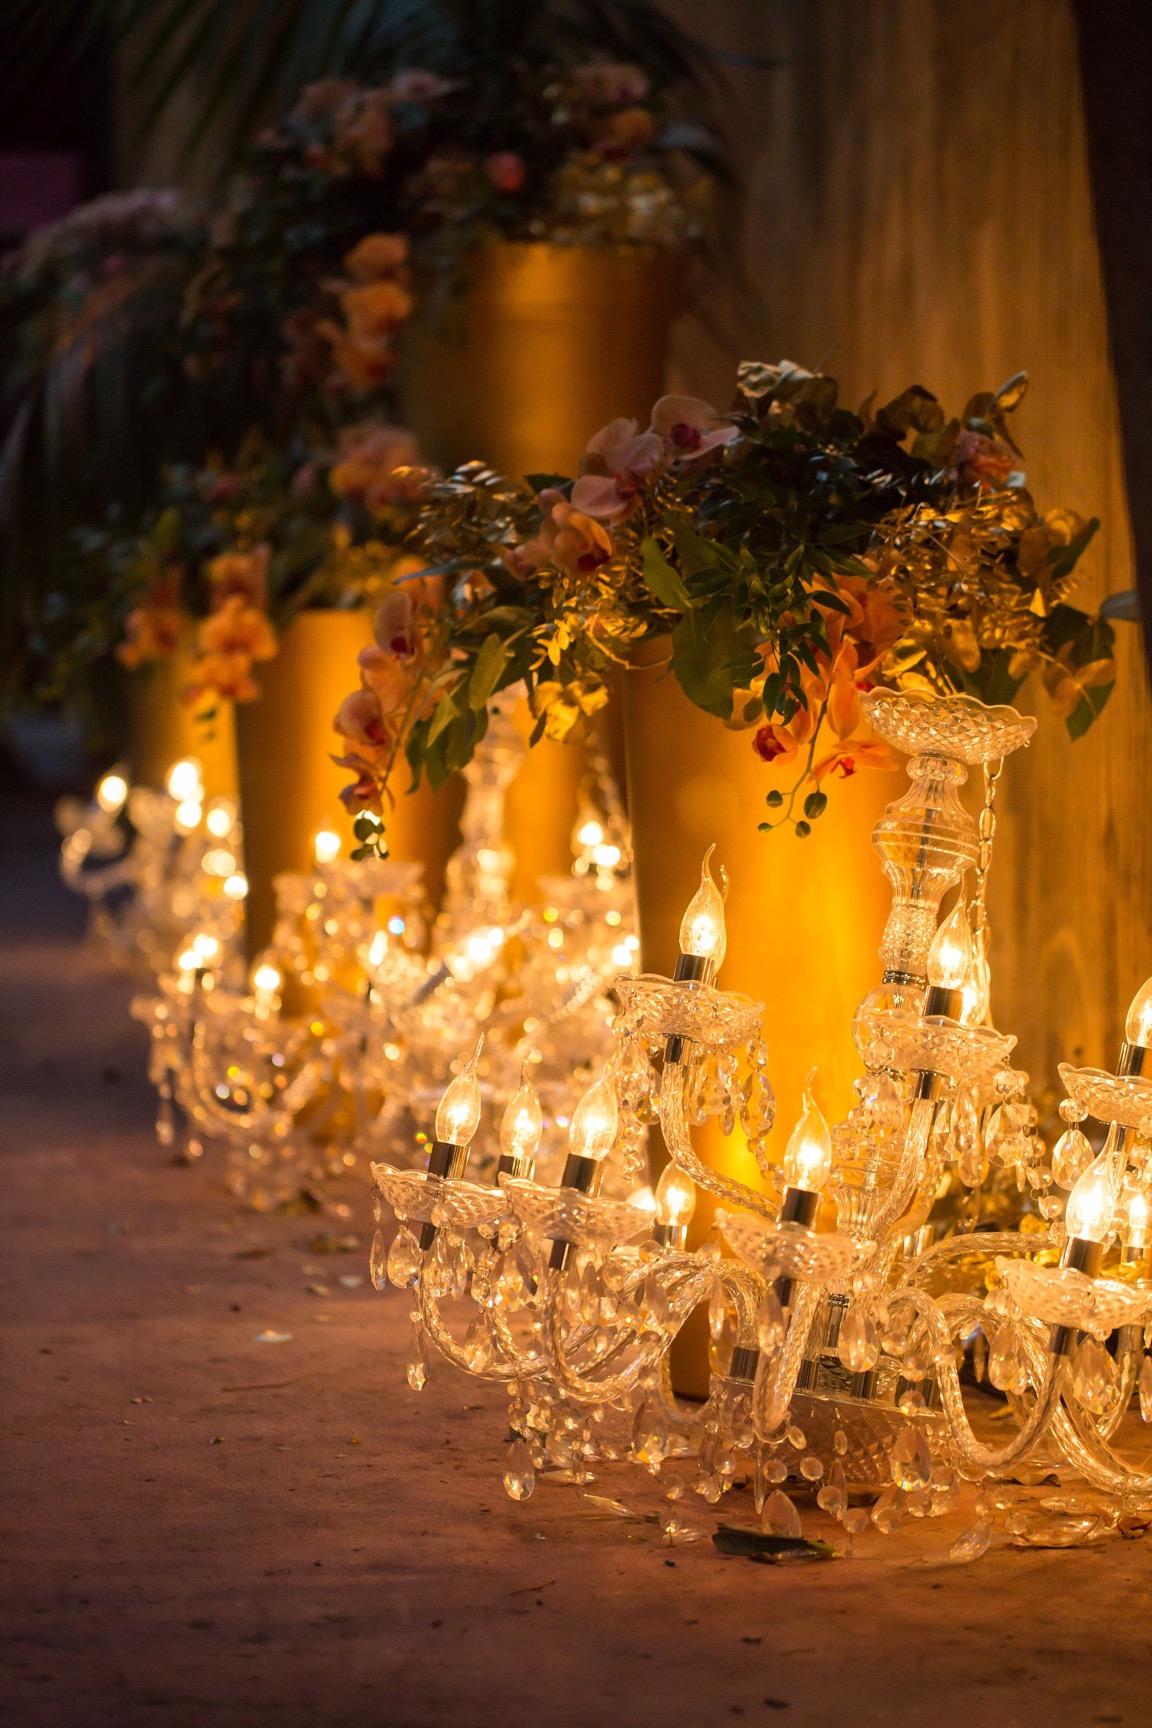 Si-Quiero-Wedding-Planner-By-Sira-Antequera-Bodas-Málaga-Marbella-Miami- L-A-50